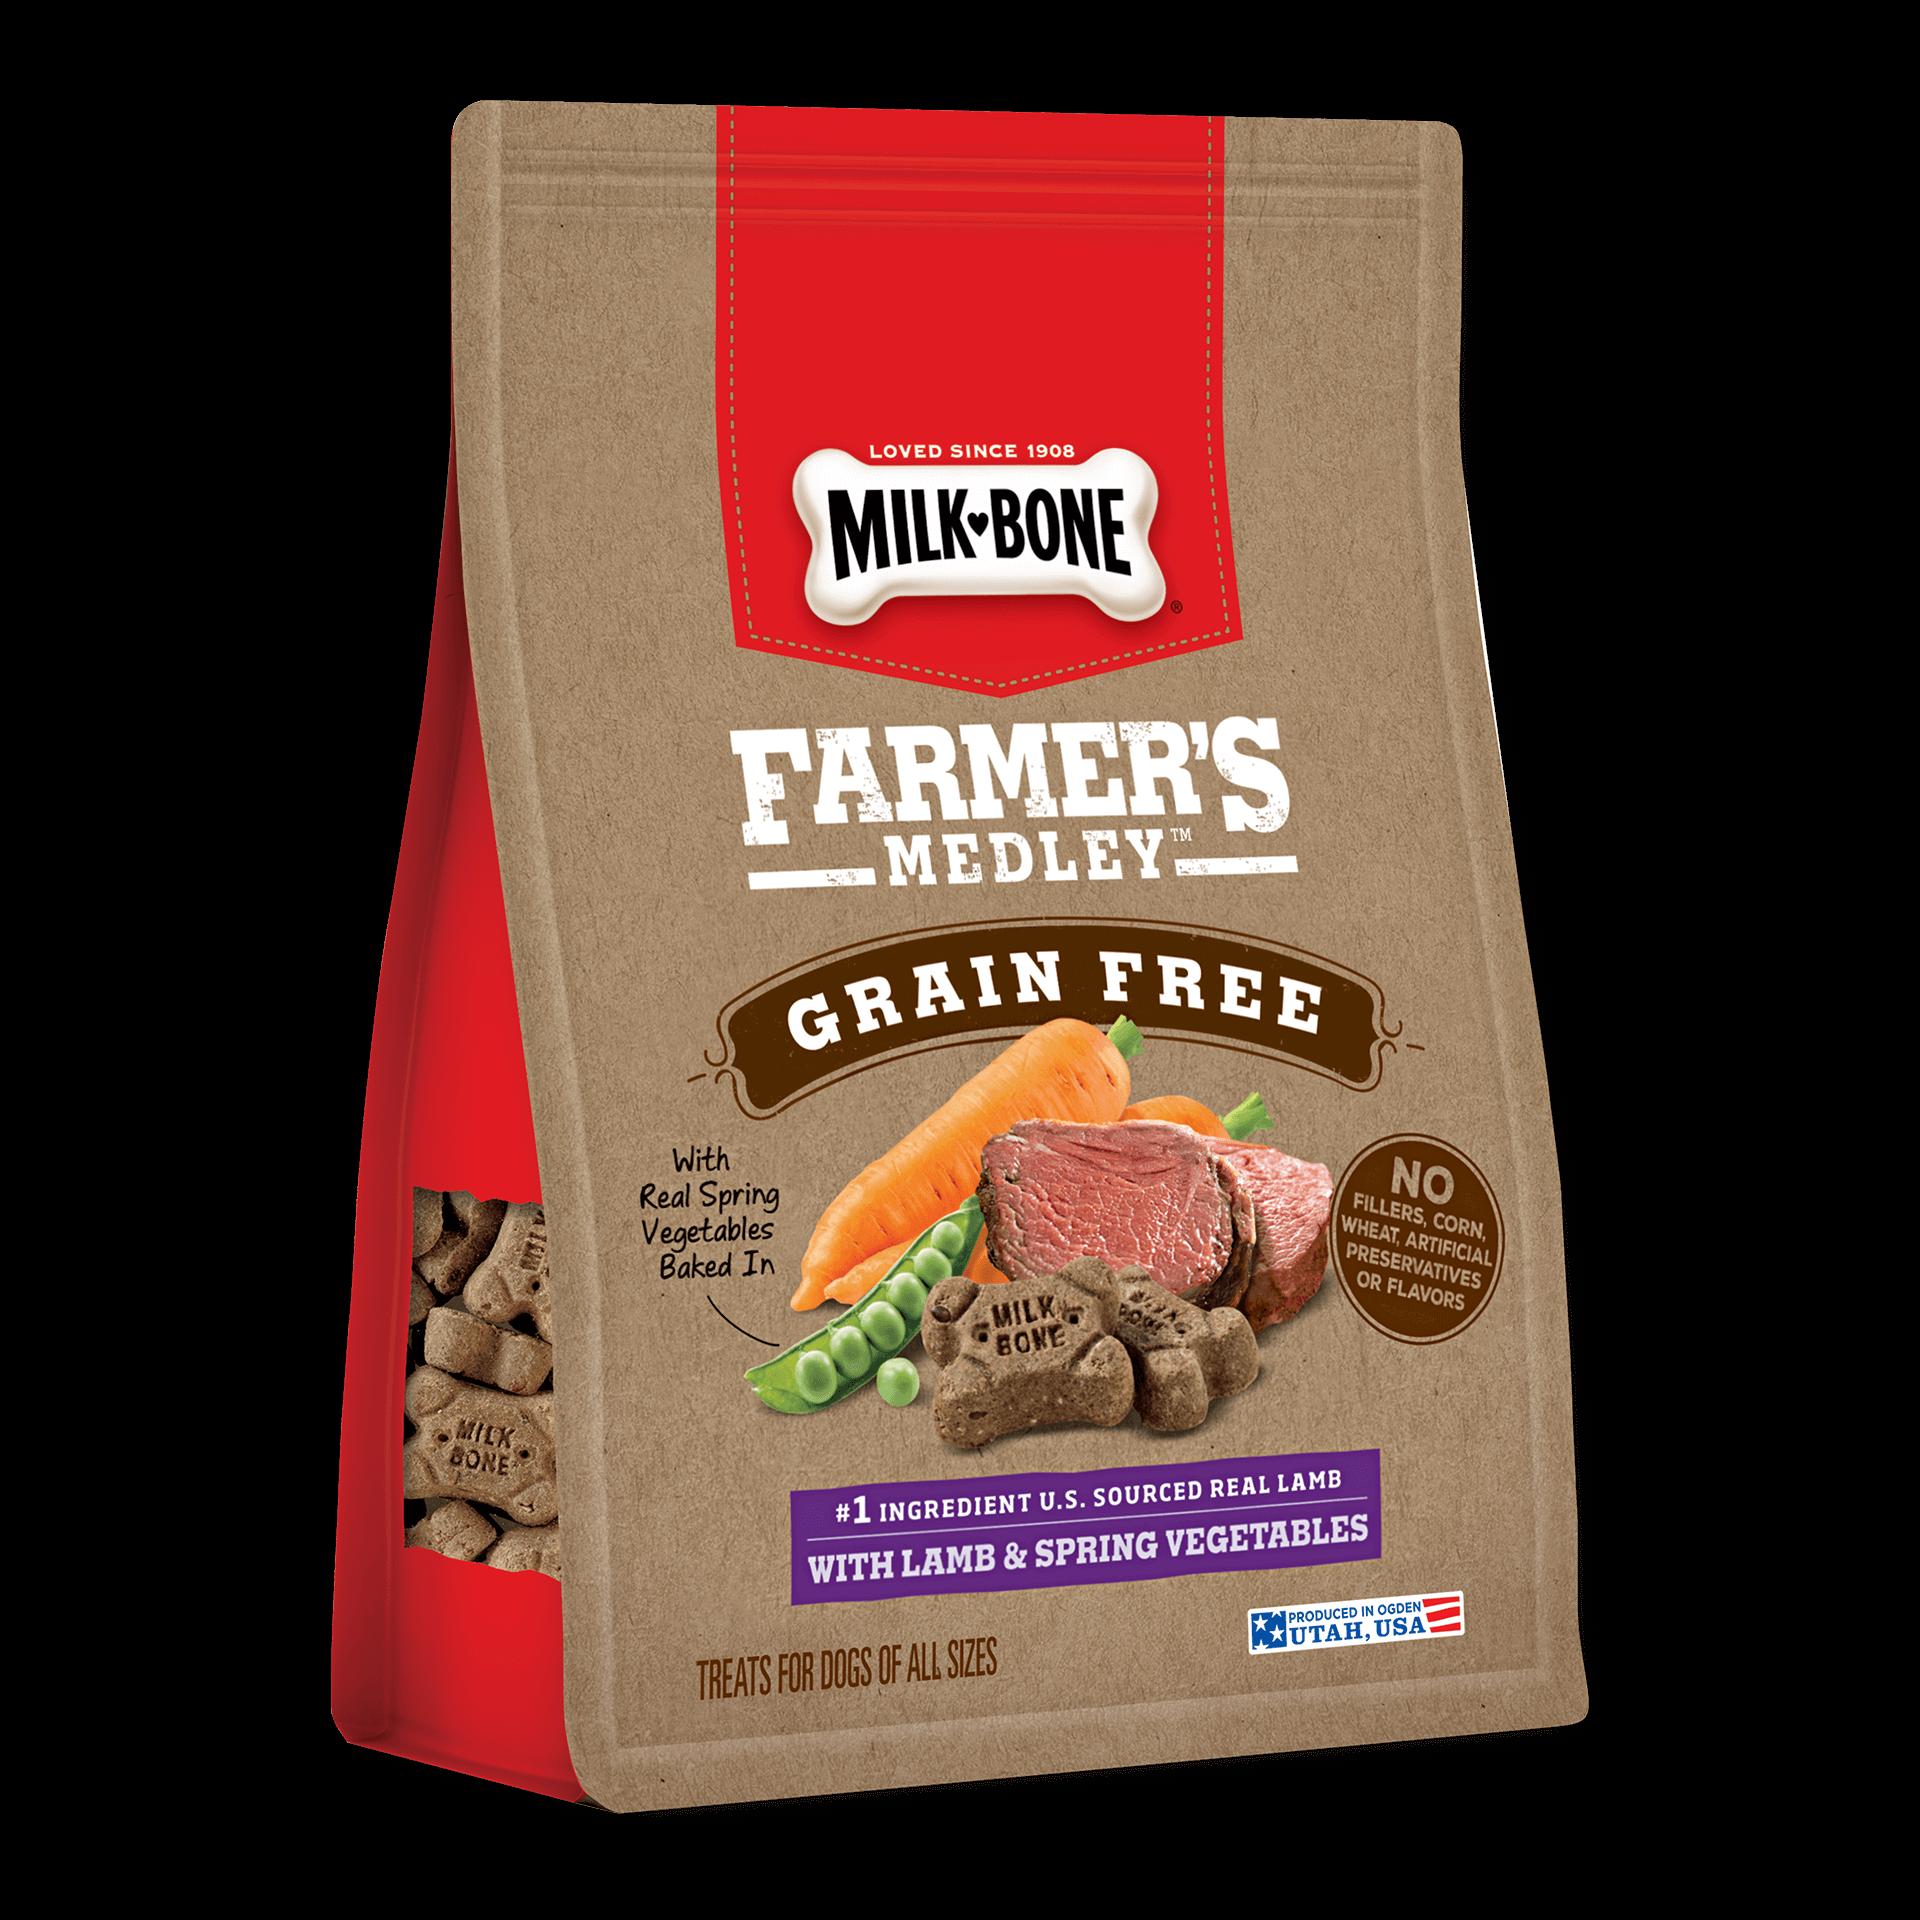 Grain clipart cereal grain. Farmer s medley dog